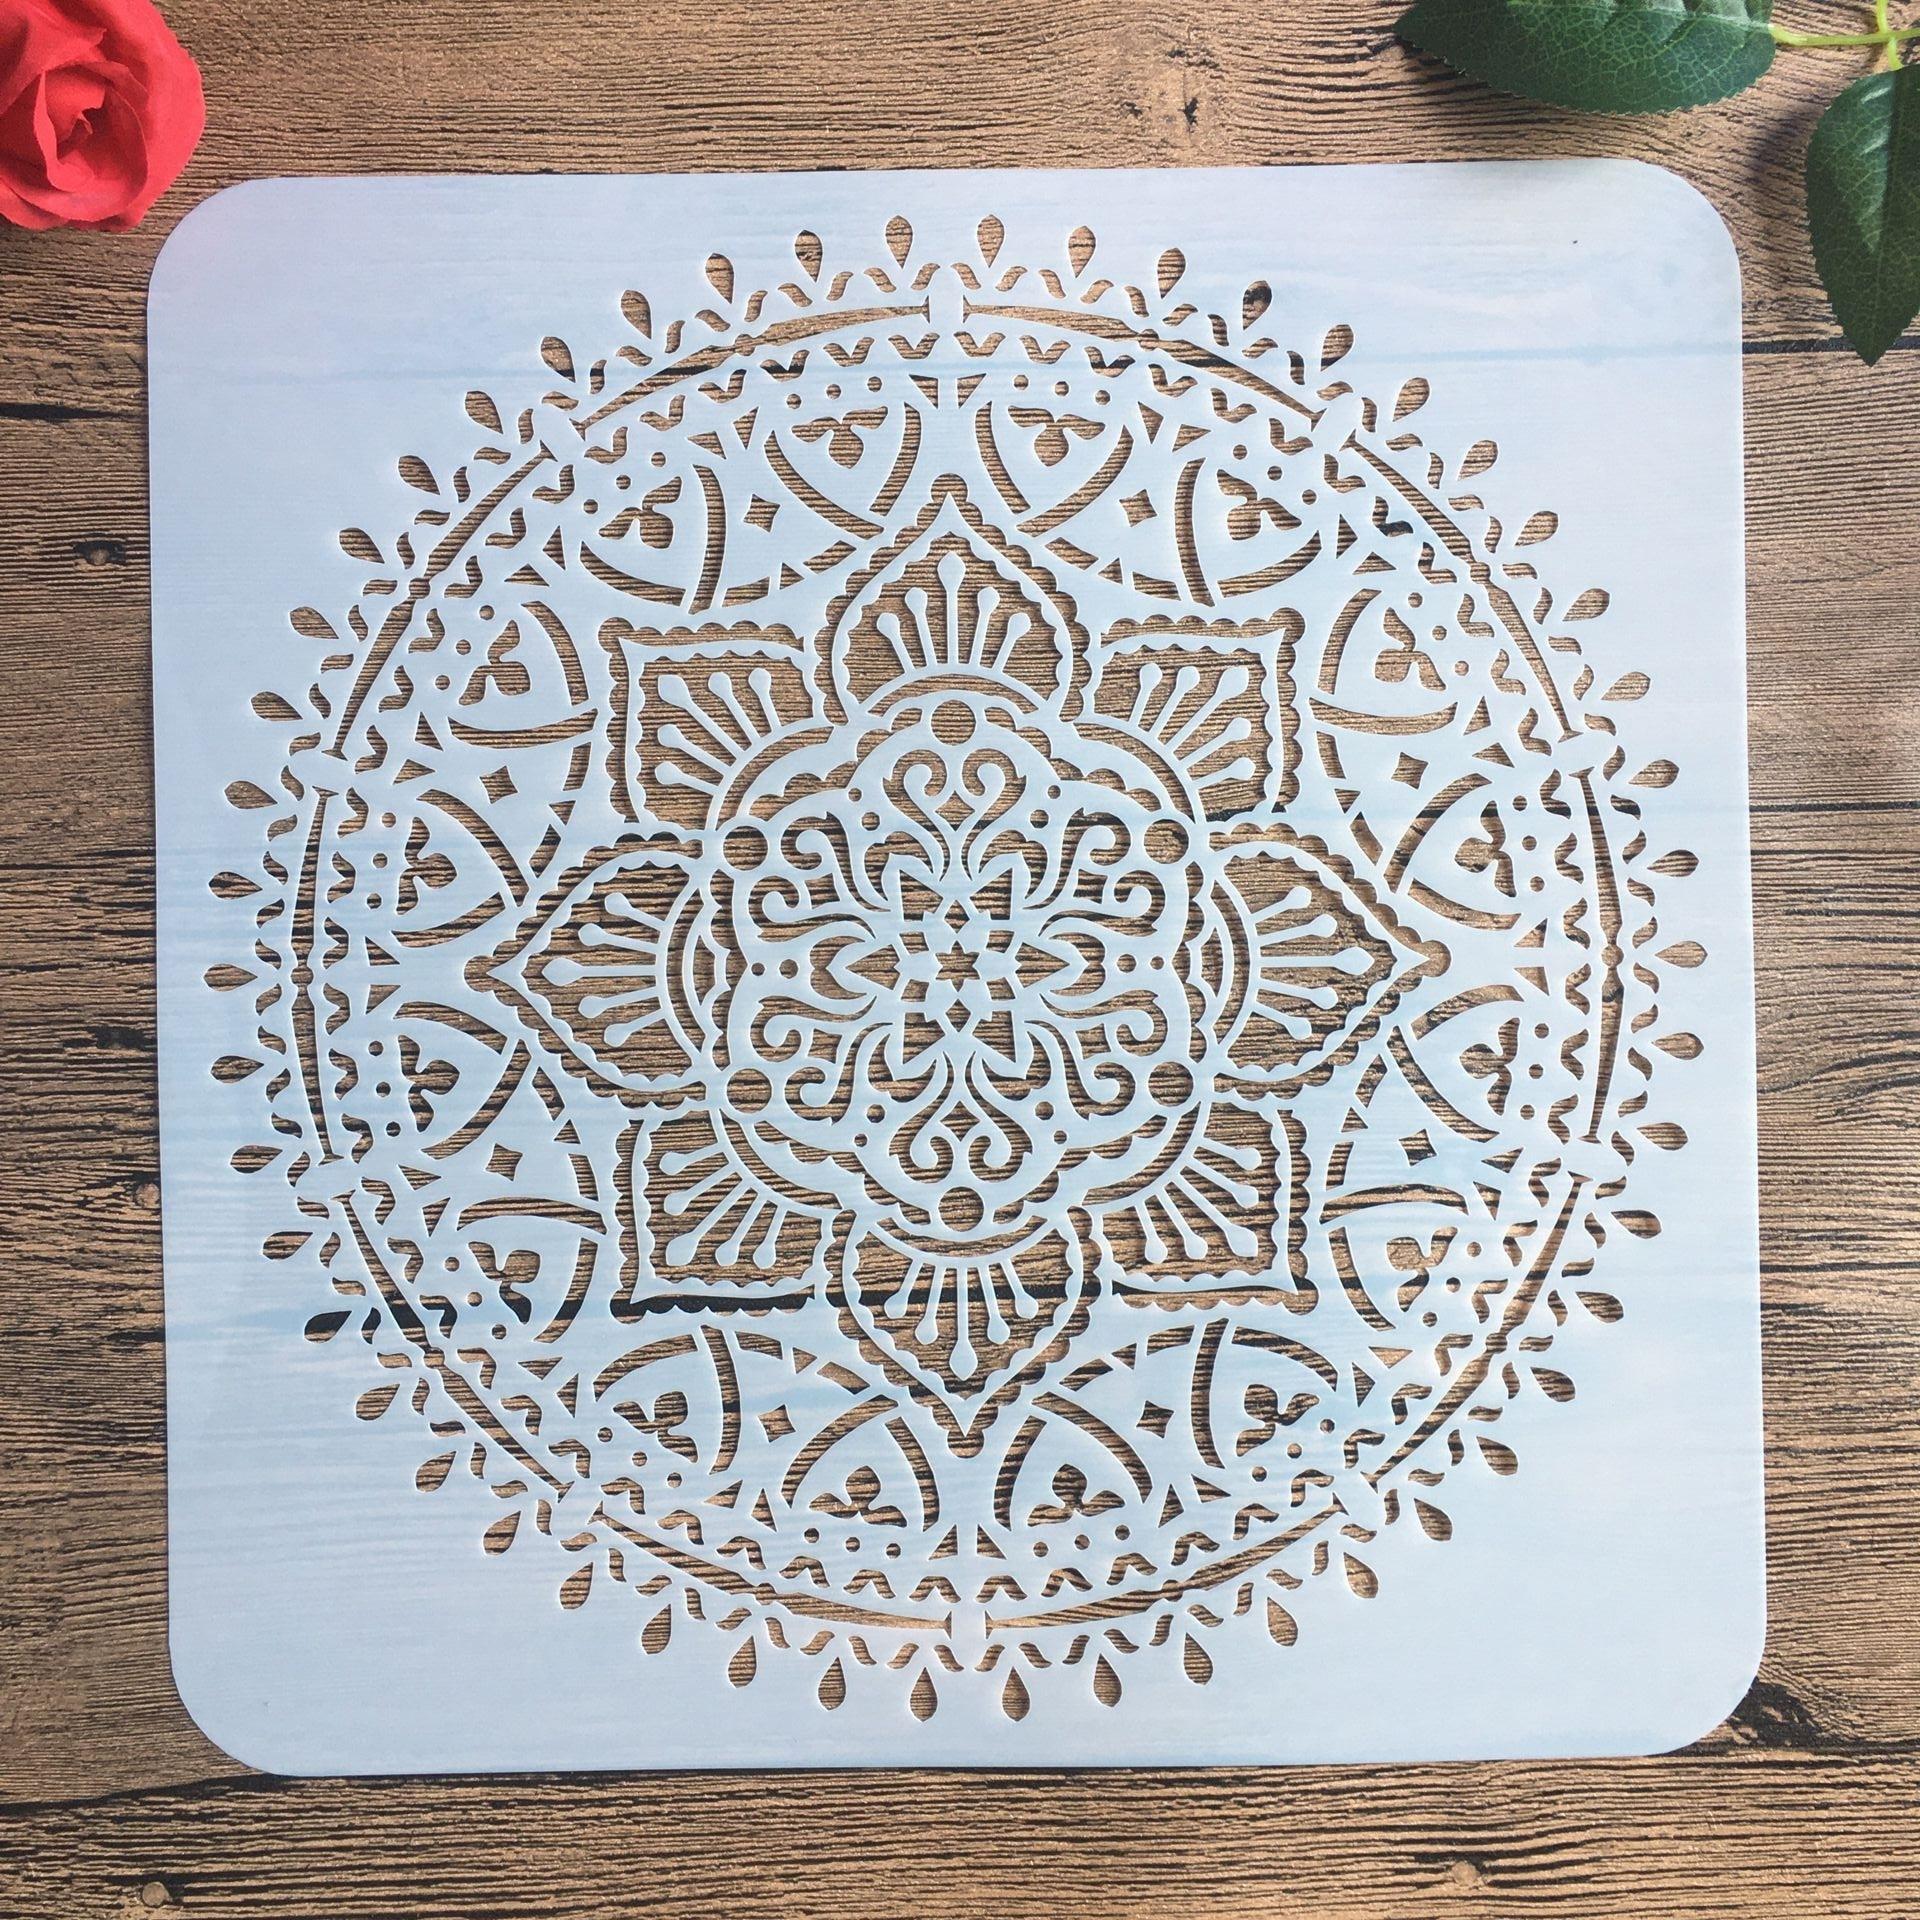 30 * 30 Cm Large Round Flower Mandala Diy Stencil Painting Scrapbook Coloring Engraving Album Decoration Template Stencil -e